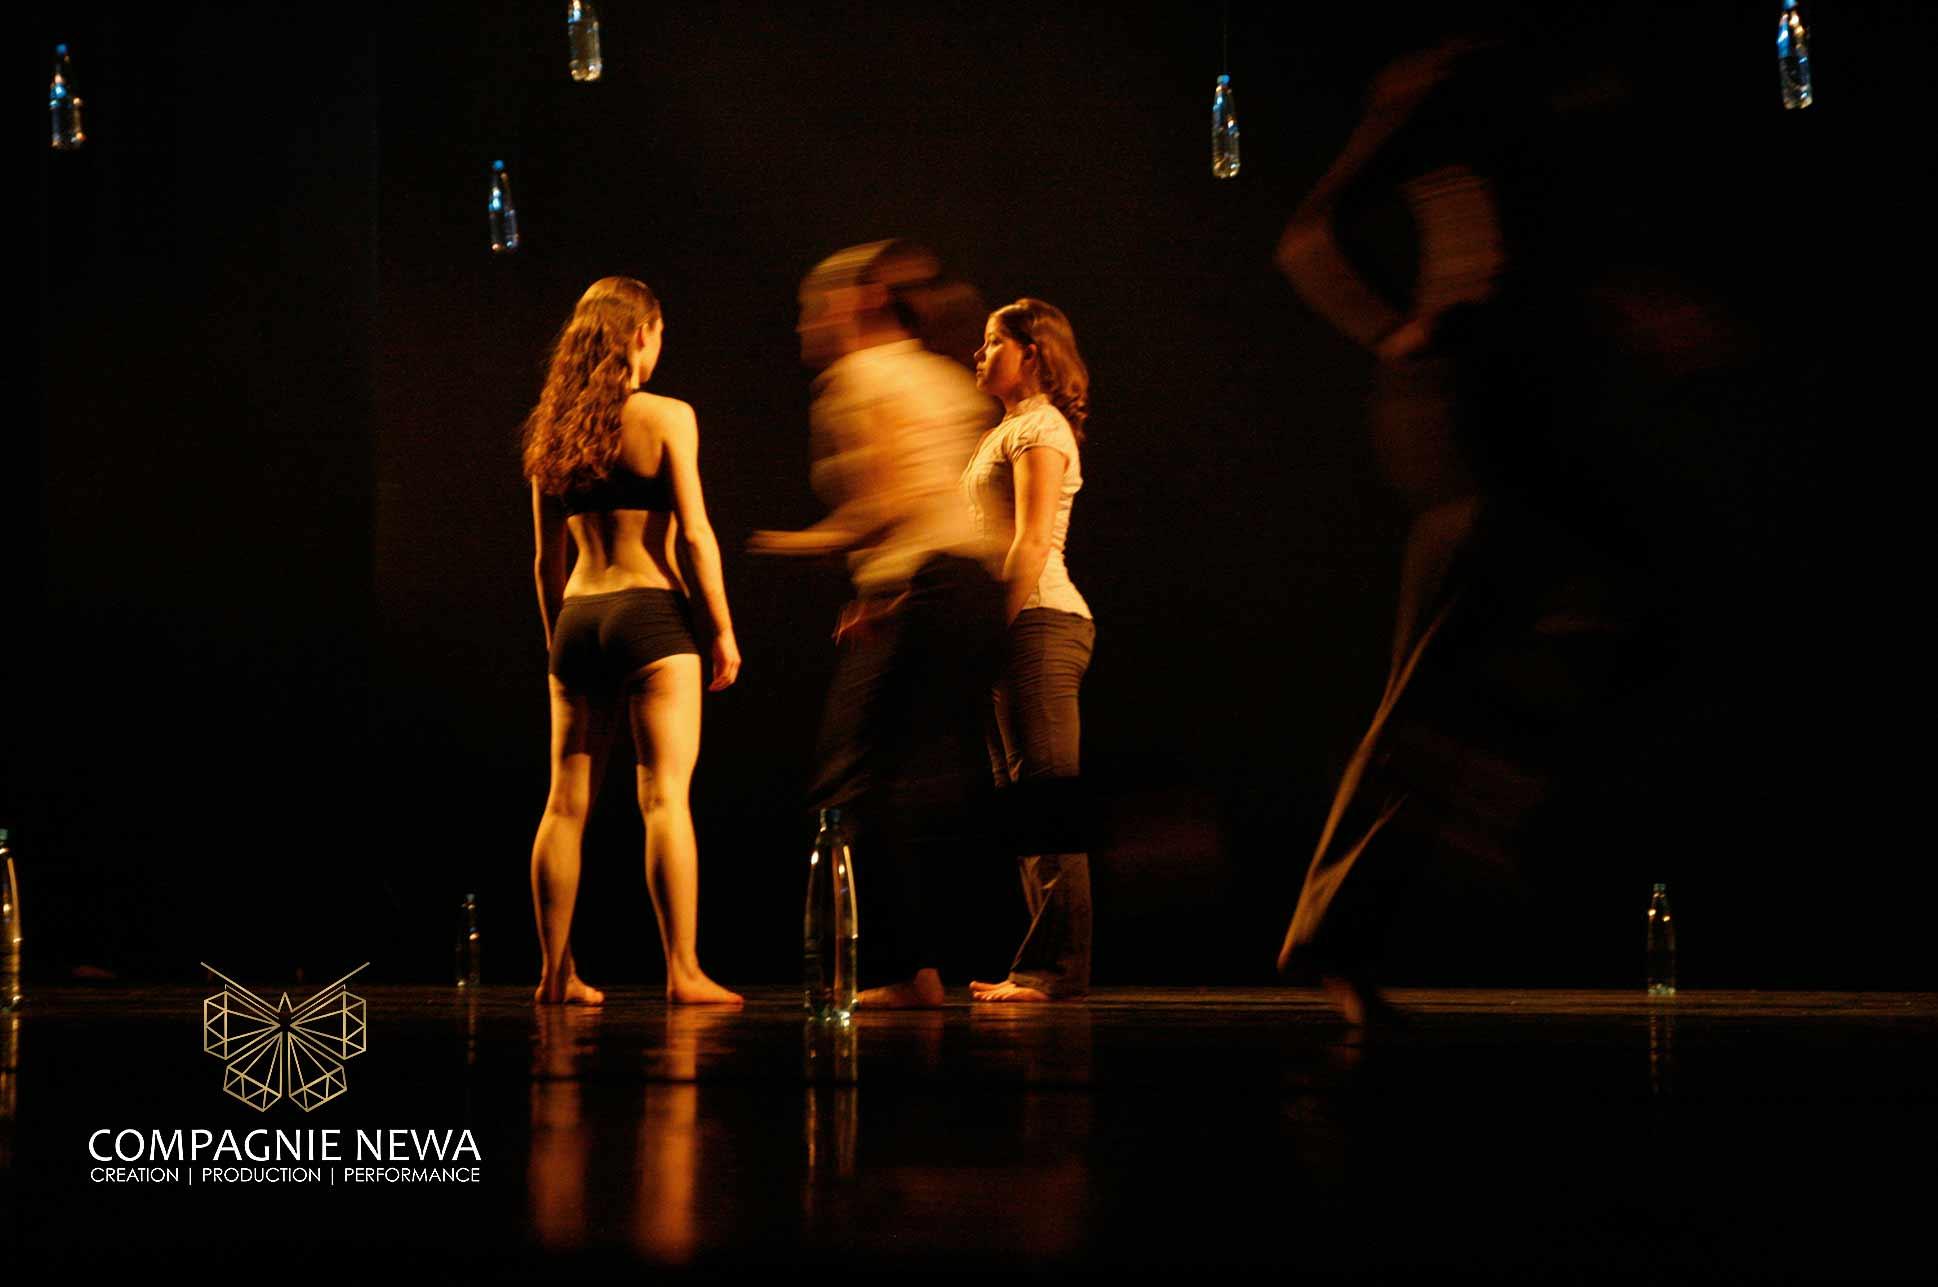 Compagnie_NEWA_blank_event_dans